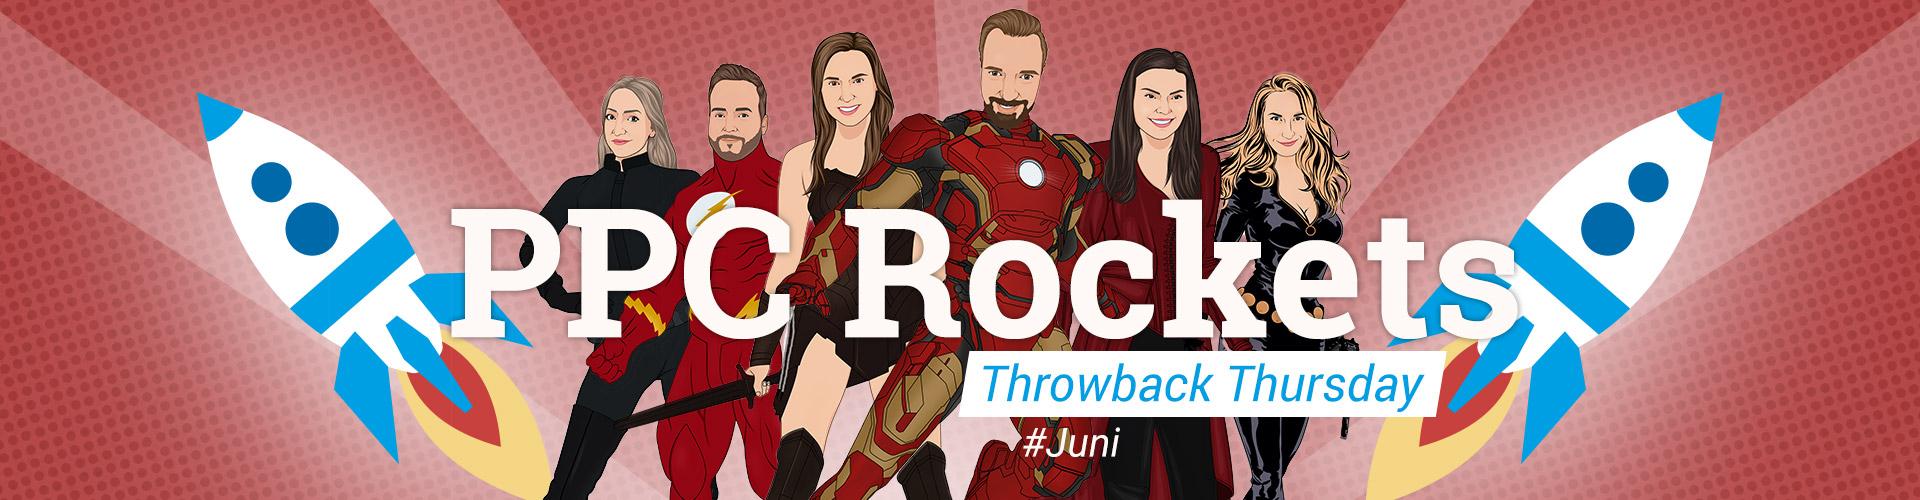 PPC Rockets #Juni